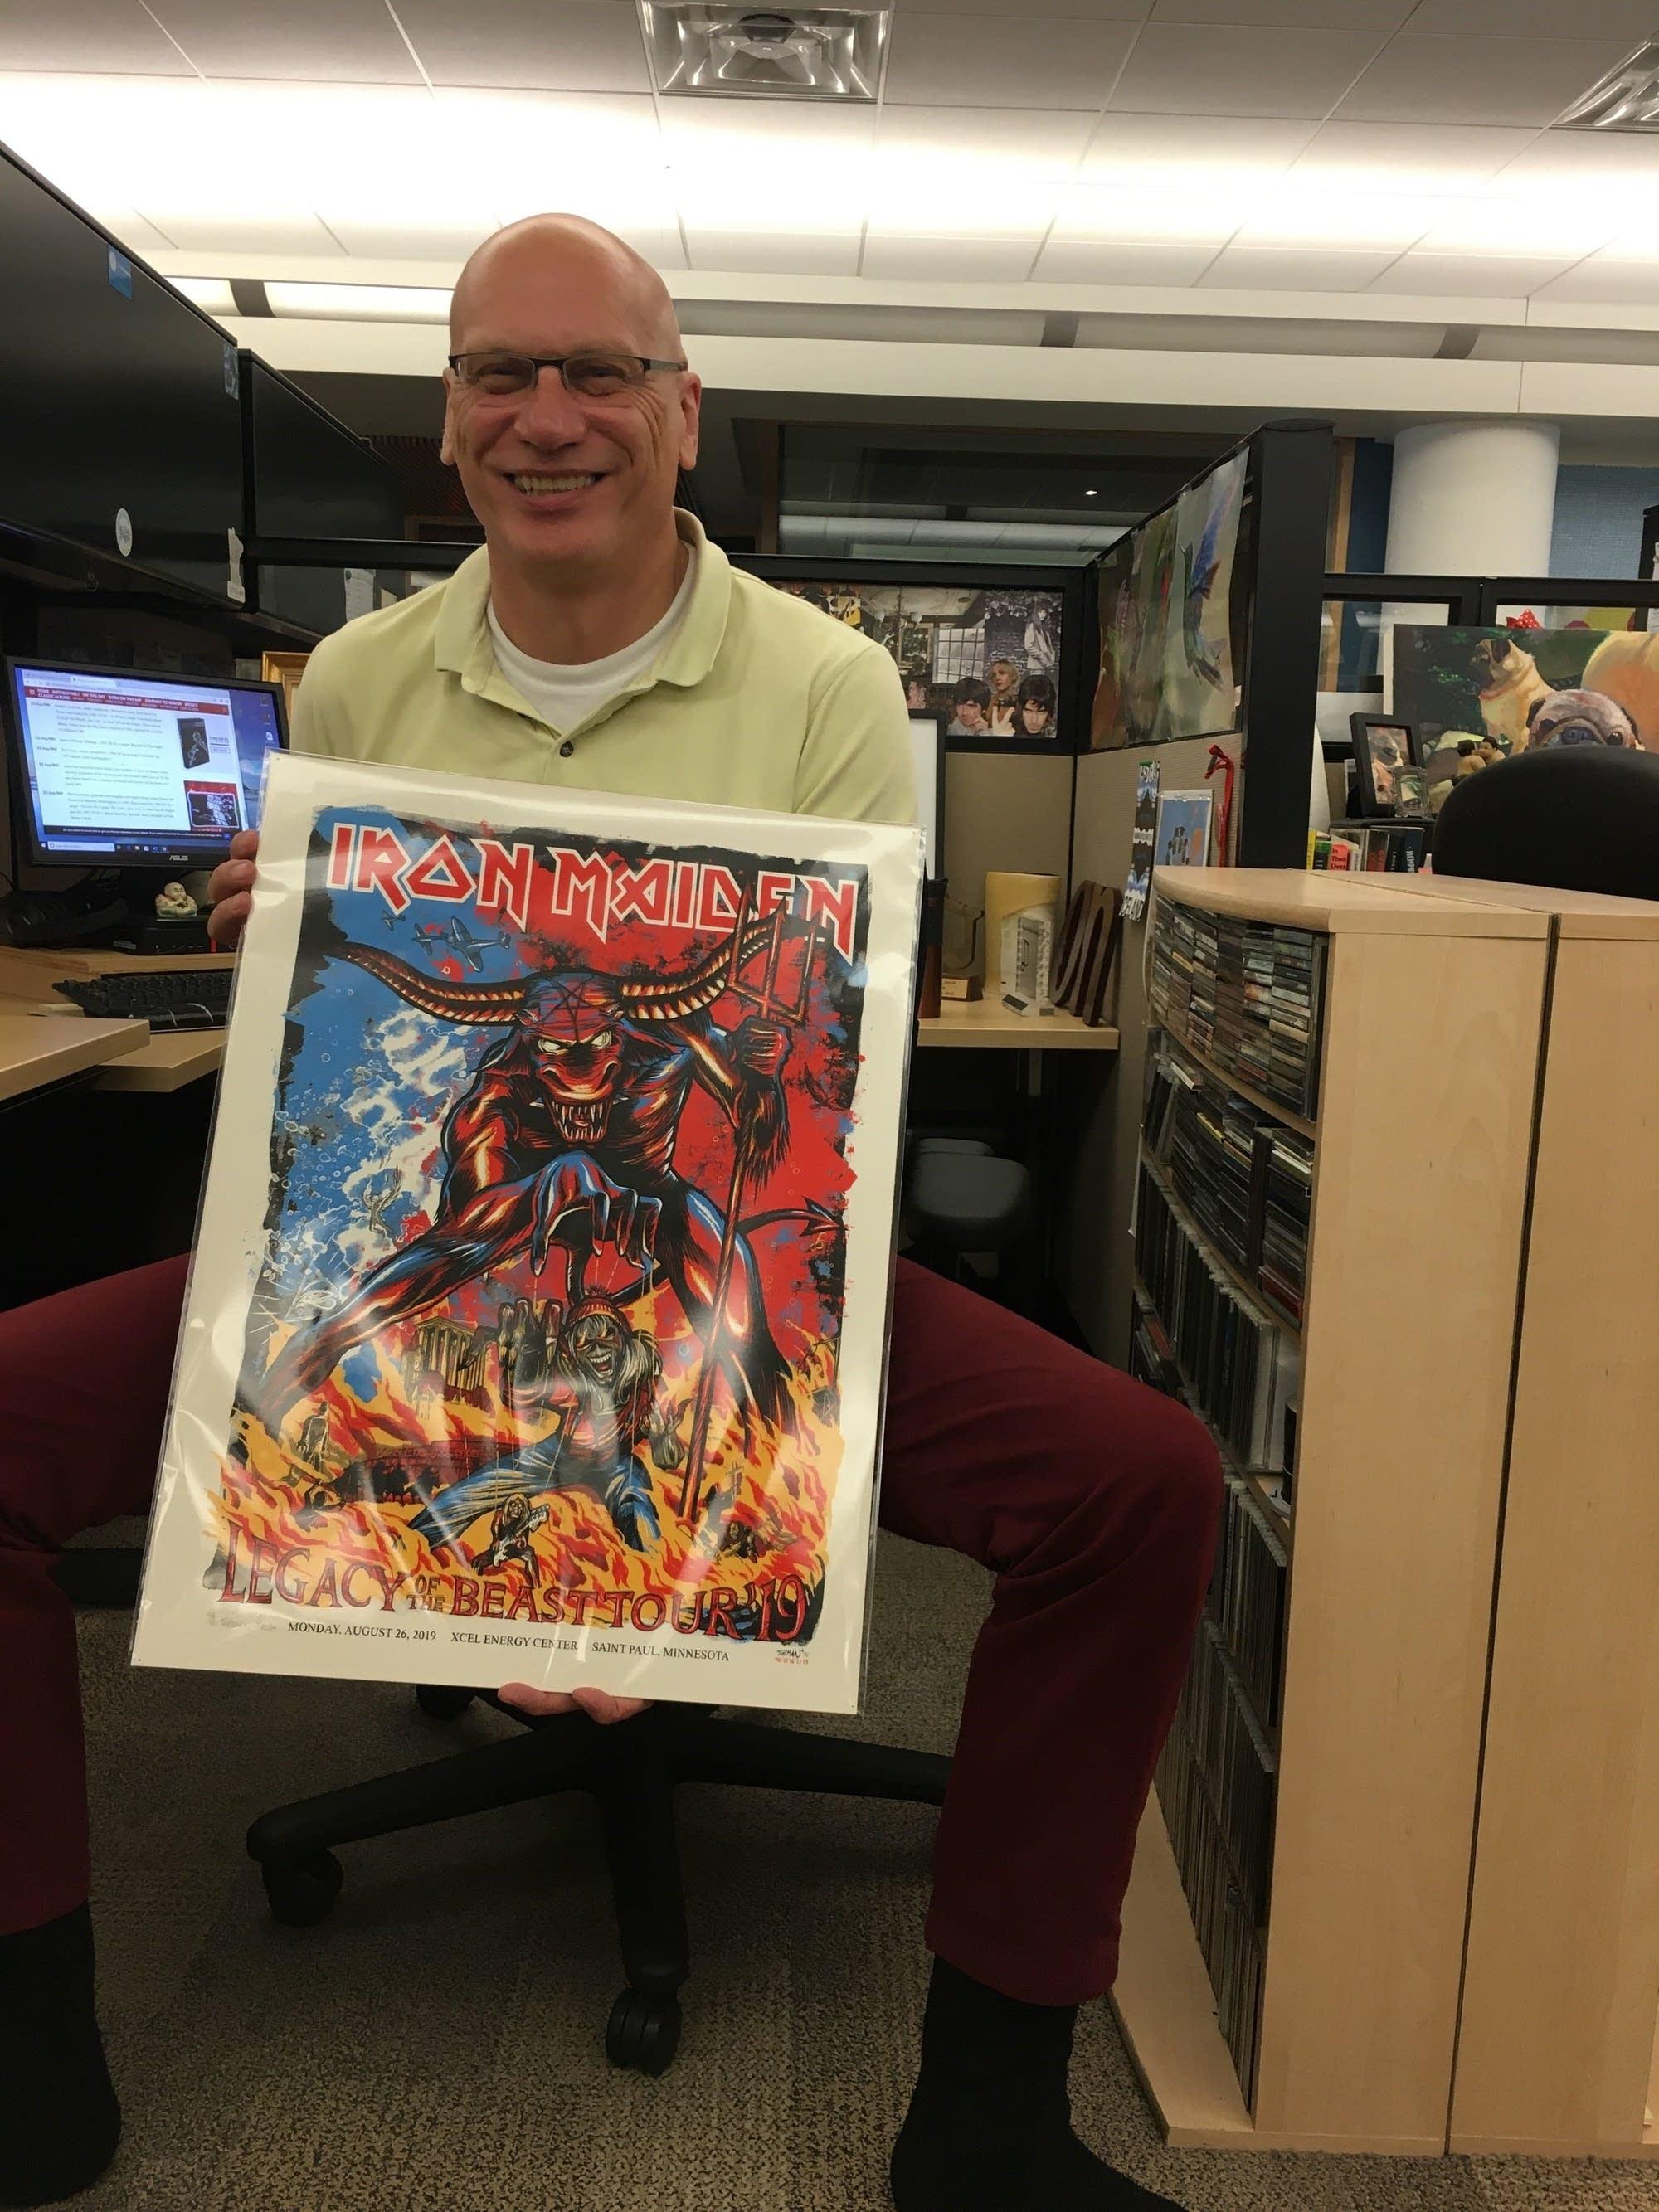 Mark Wheat with signed Adam Turman - Iron Maiden poster